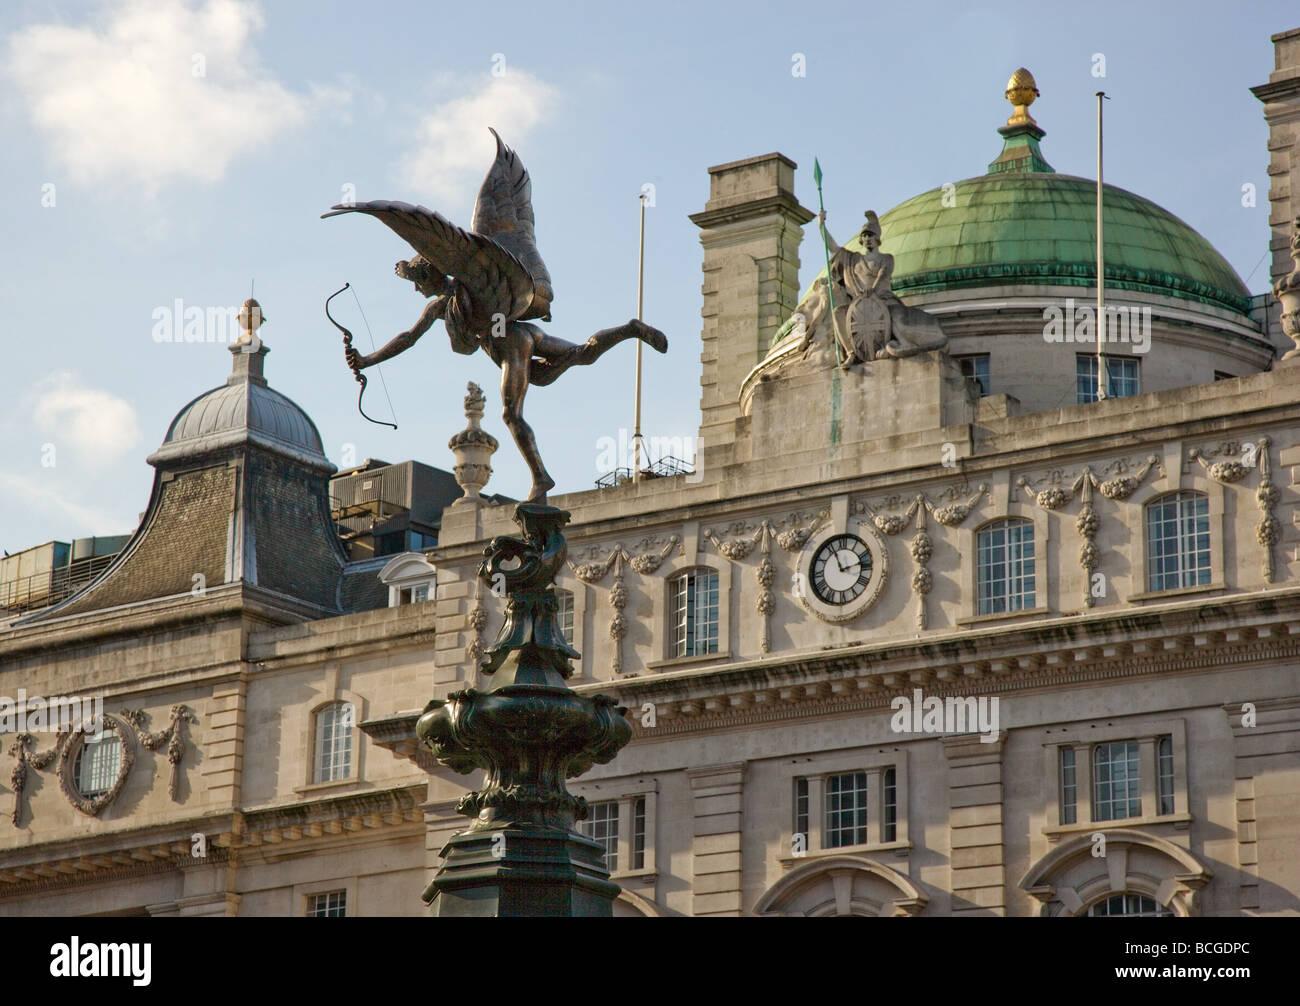 Eros and Britannia in Picaddily circus in London - Stock Image